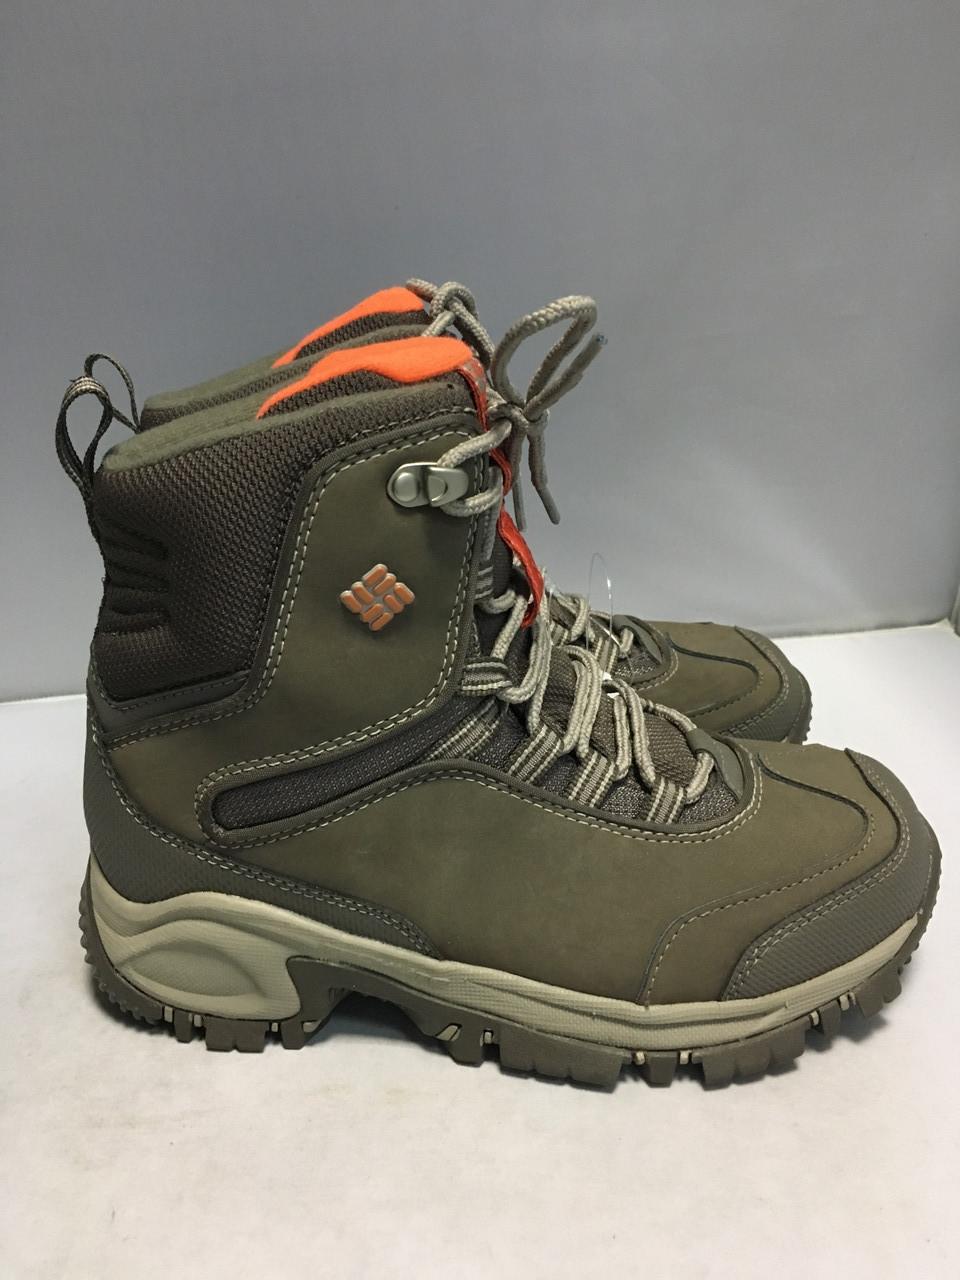 Женские зимние ботинки Columbia, 38 размер